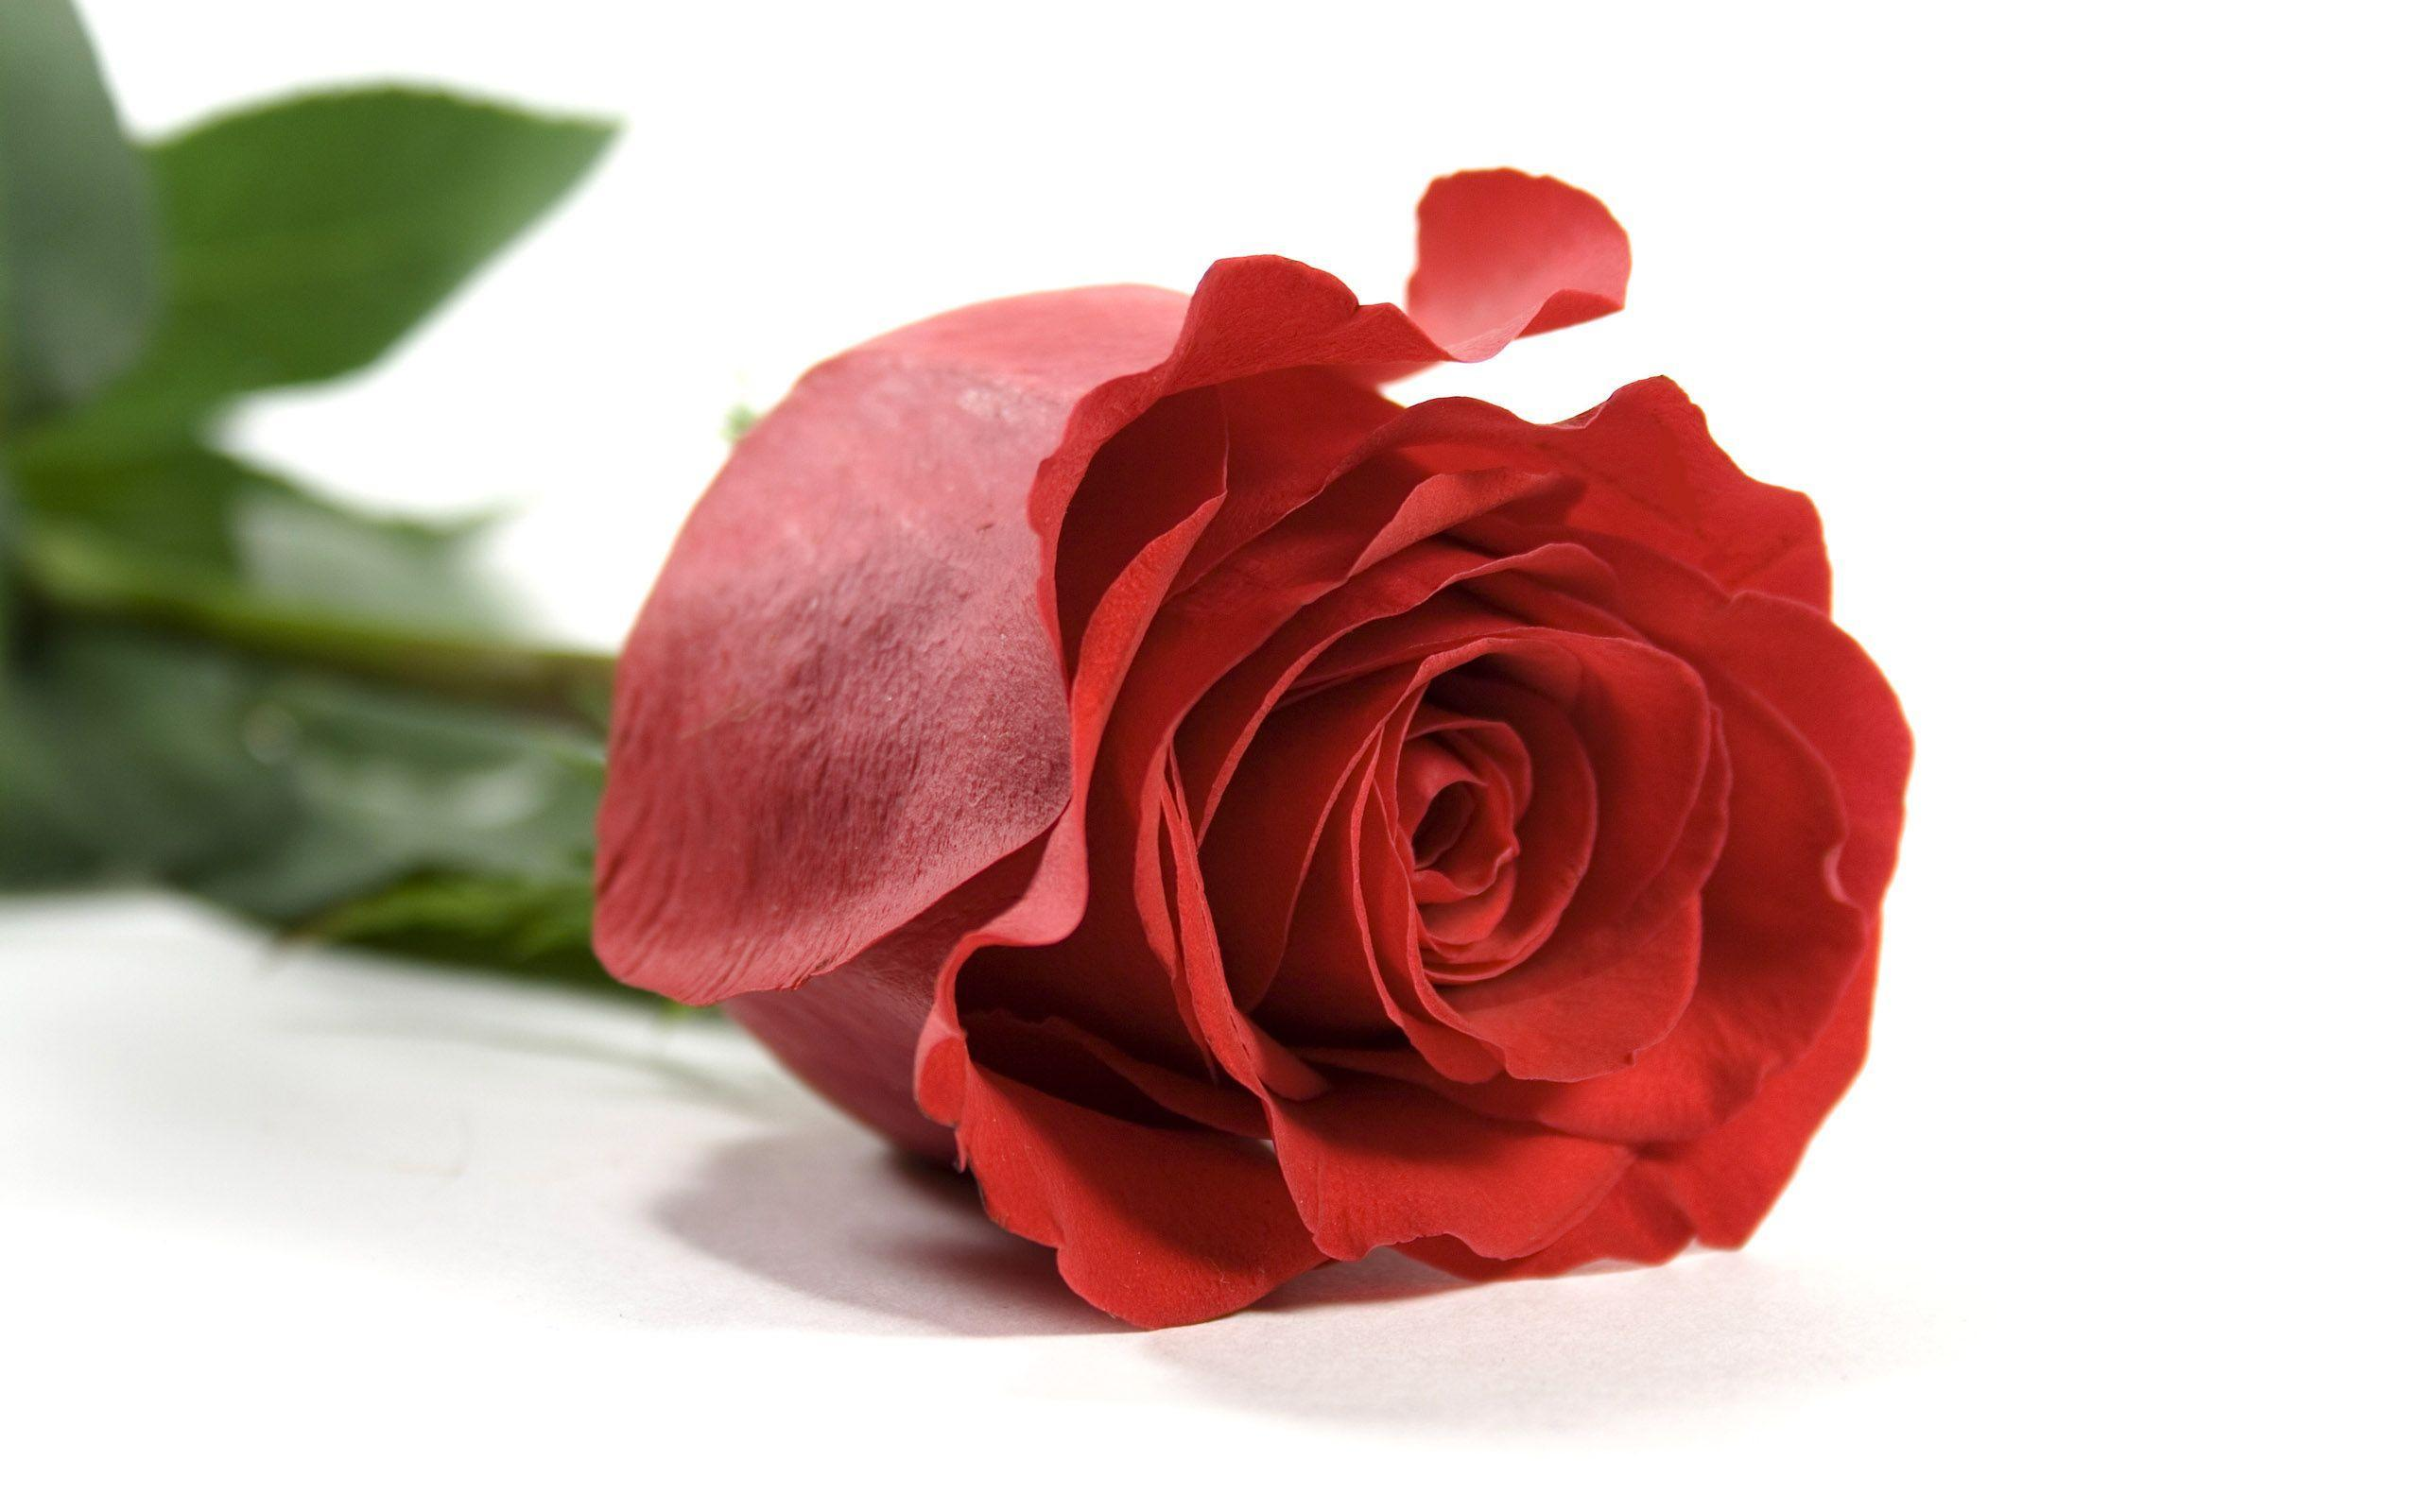 Rose Wallpaper 5525 2560x1600 px ~ FreeWallSource.